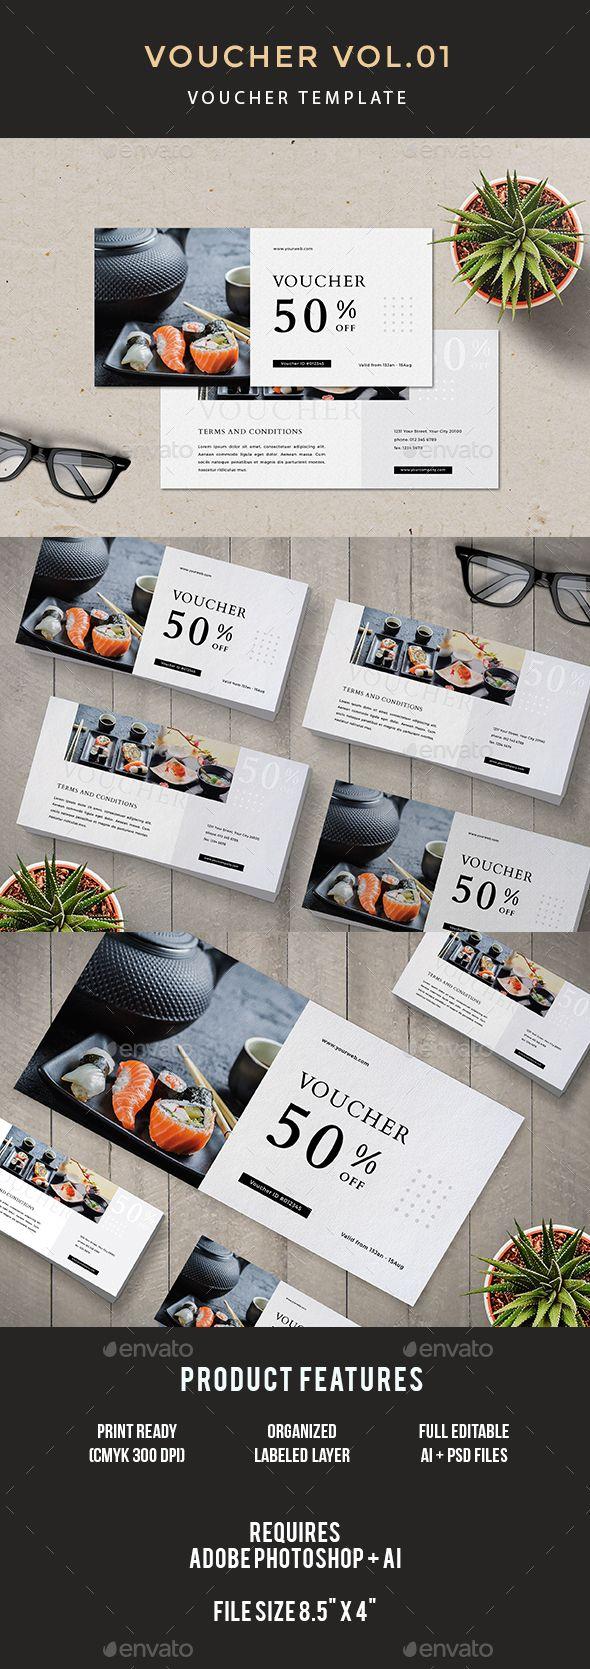 9 best Nice Voucher images on Pinterest | Coupon design, Gift ...